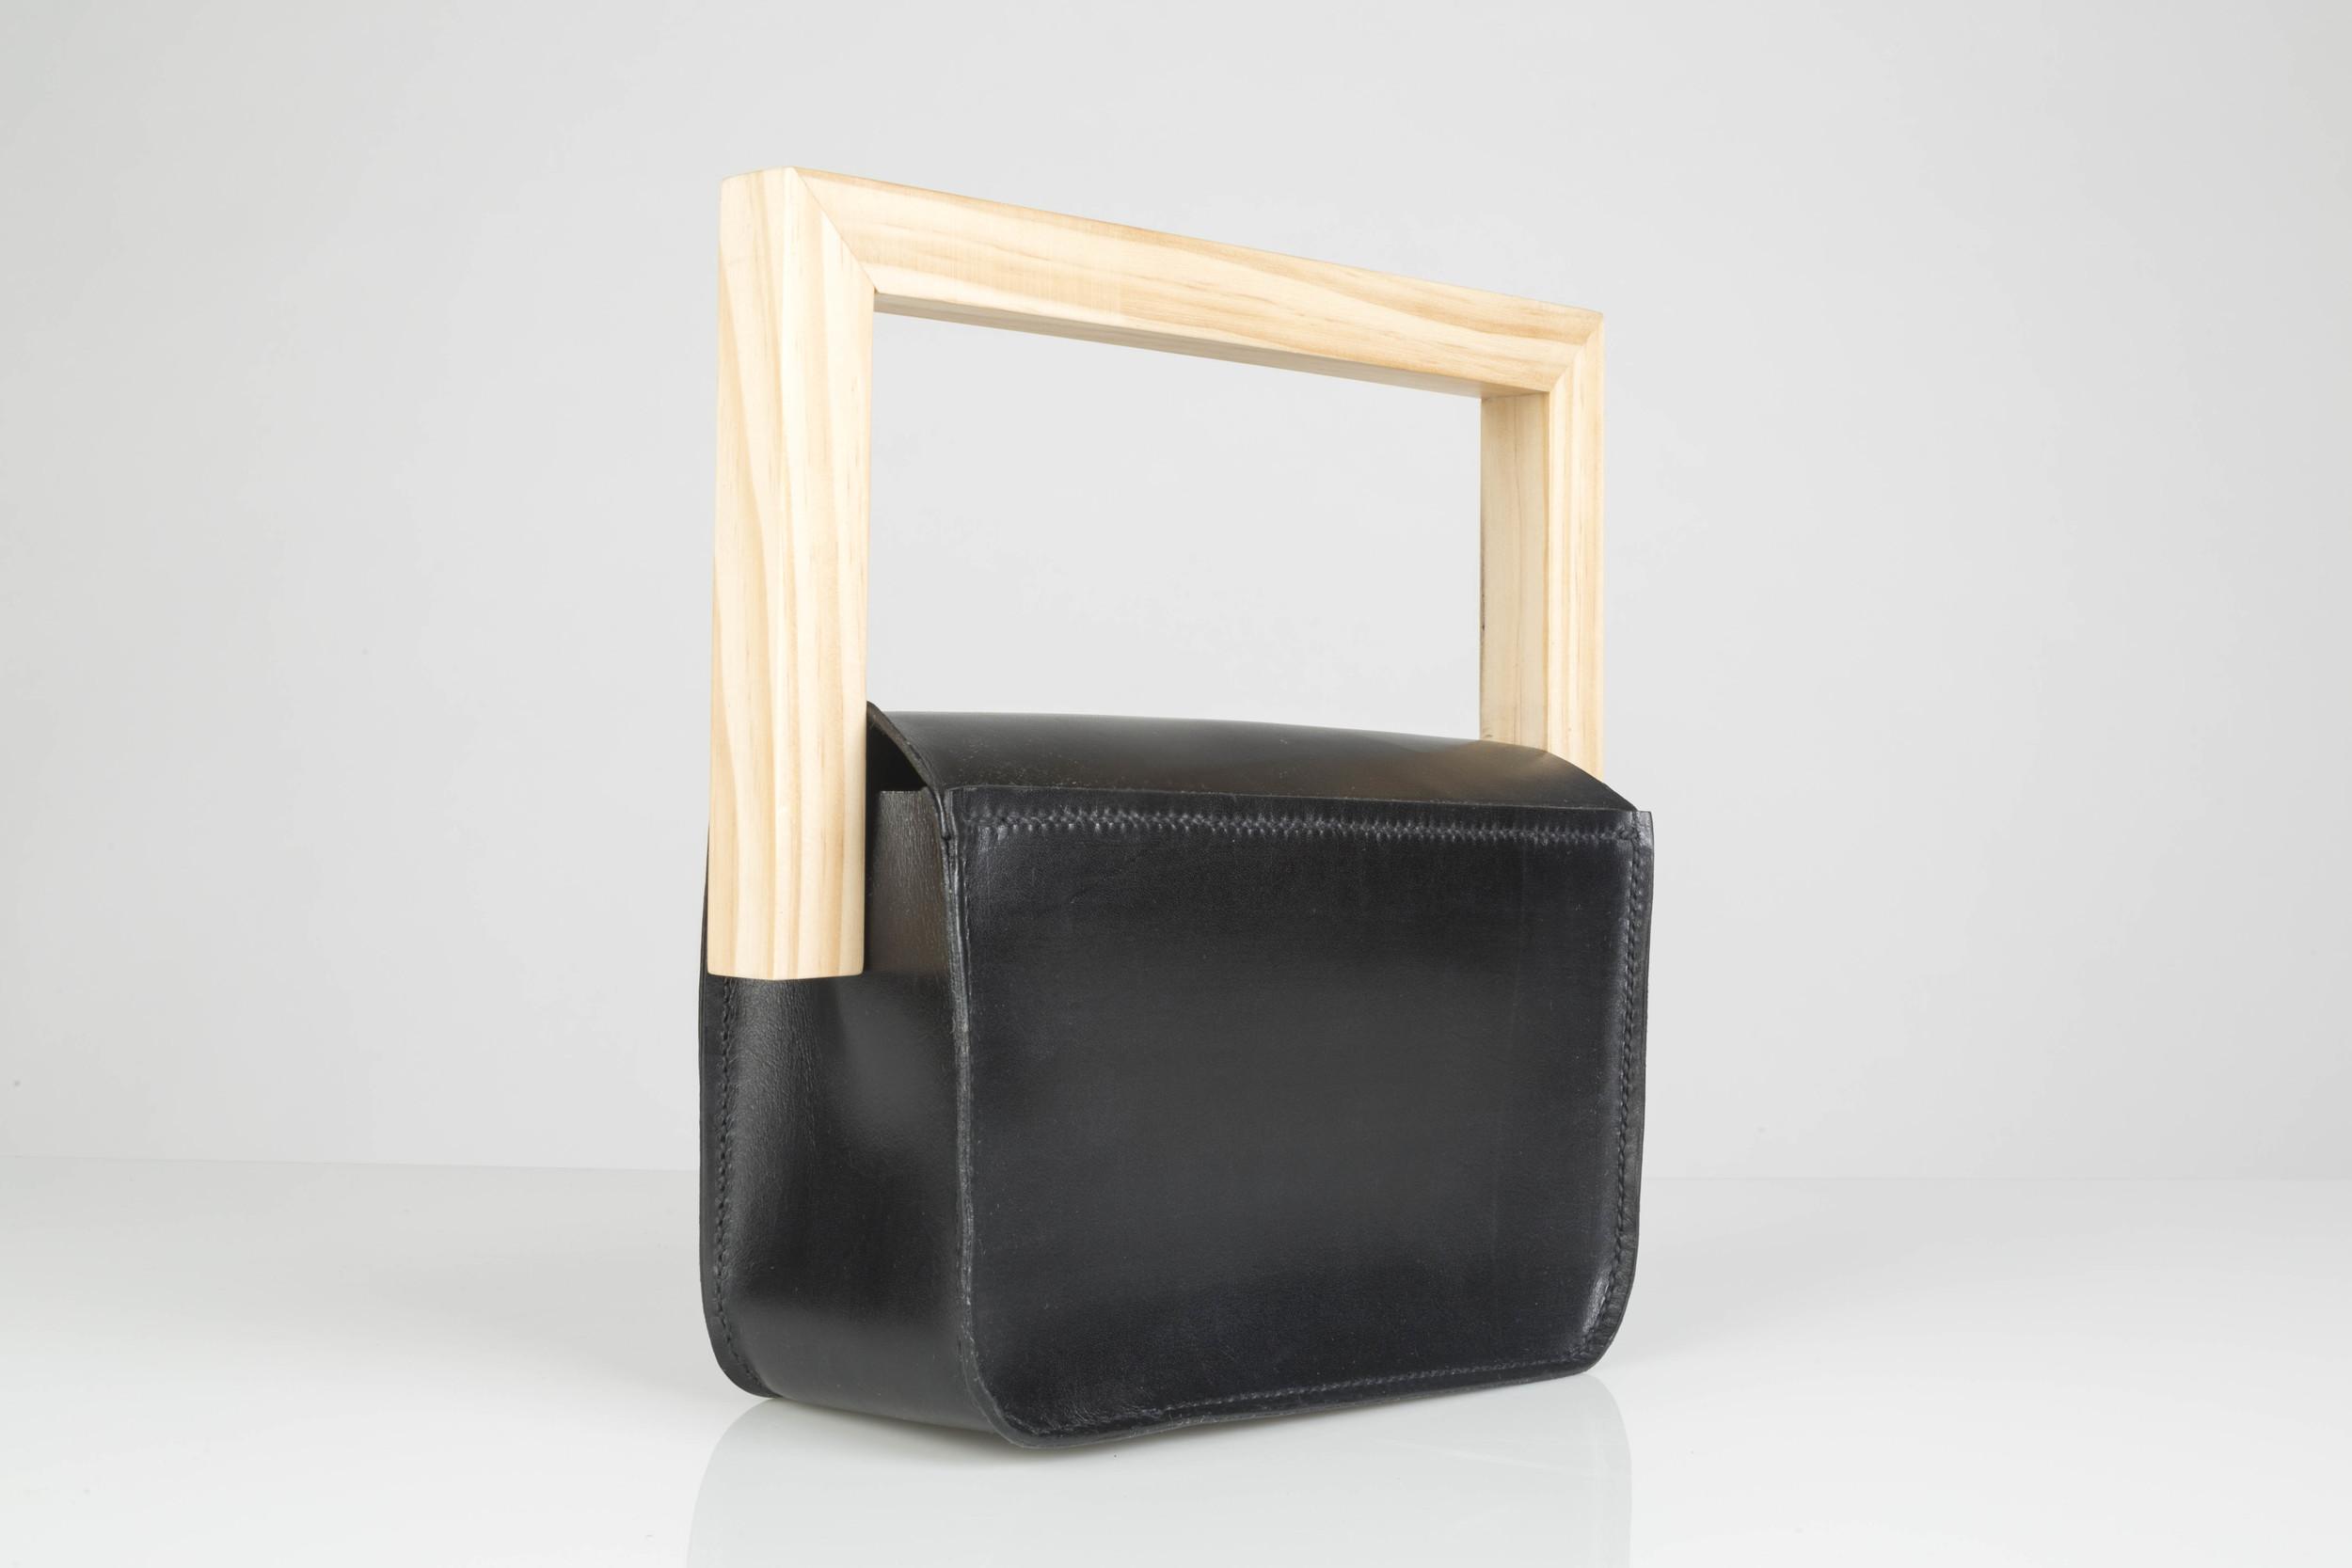 LITERALLYHandbags-4.jpg